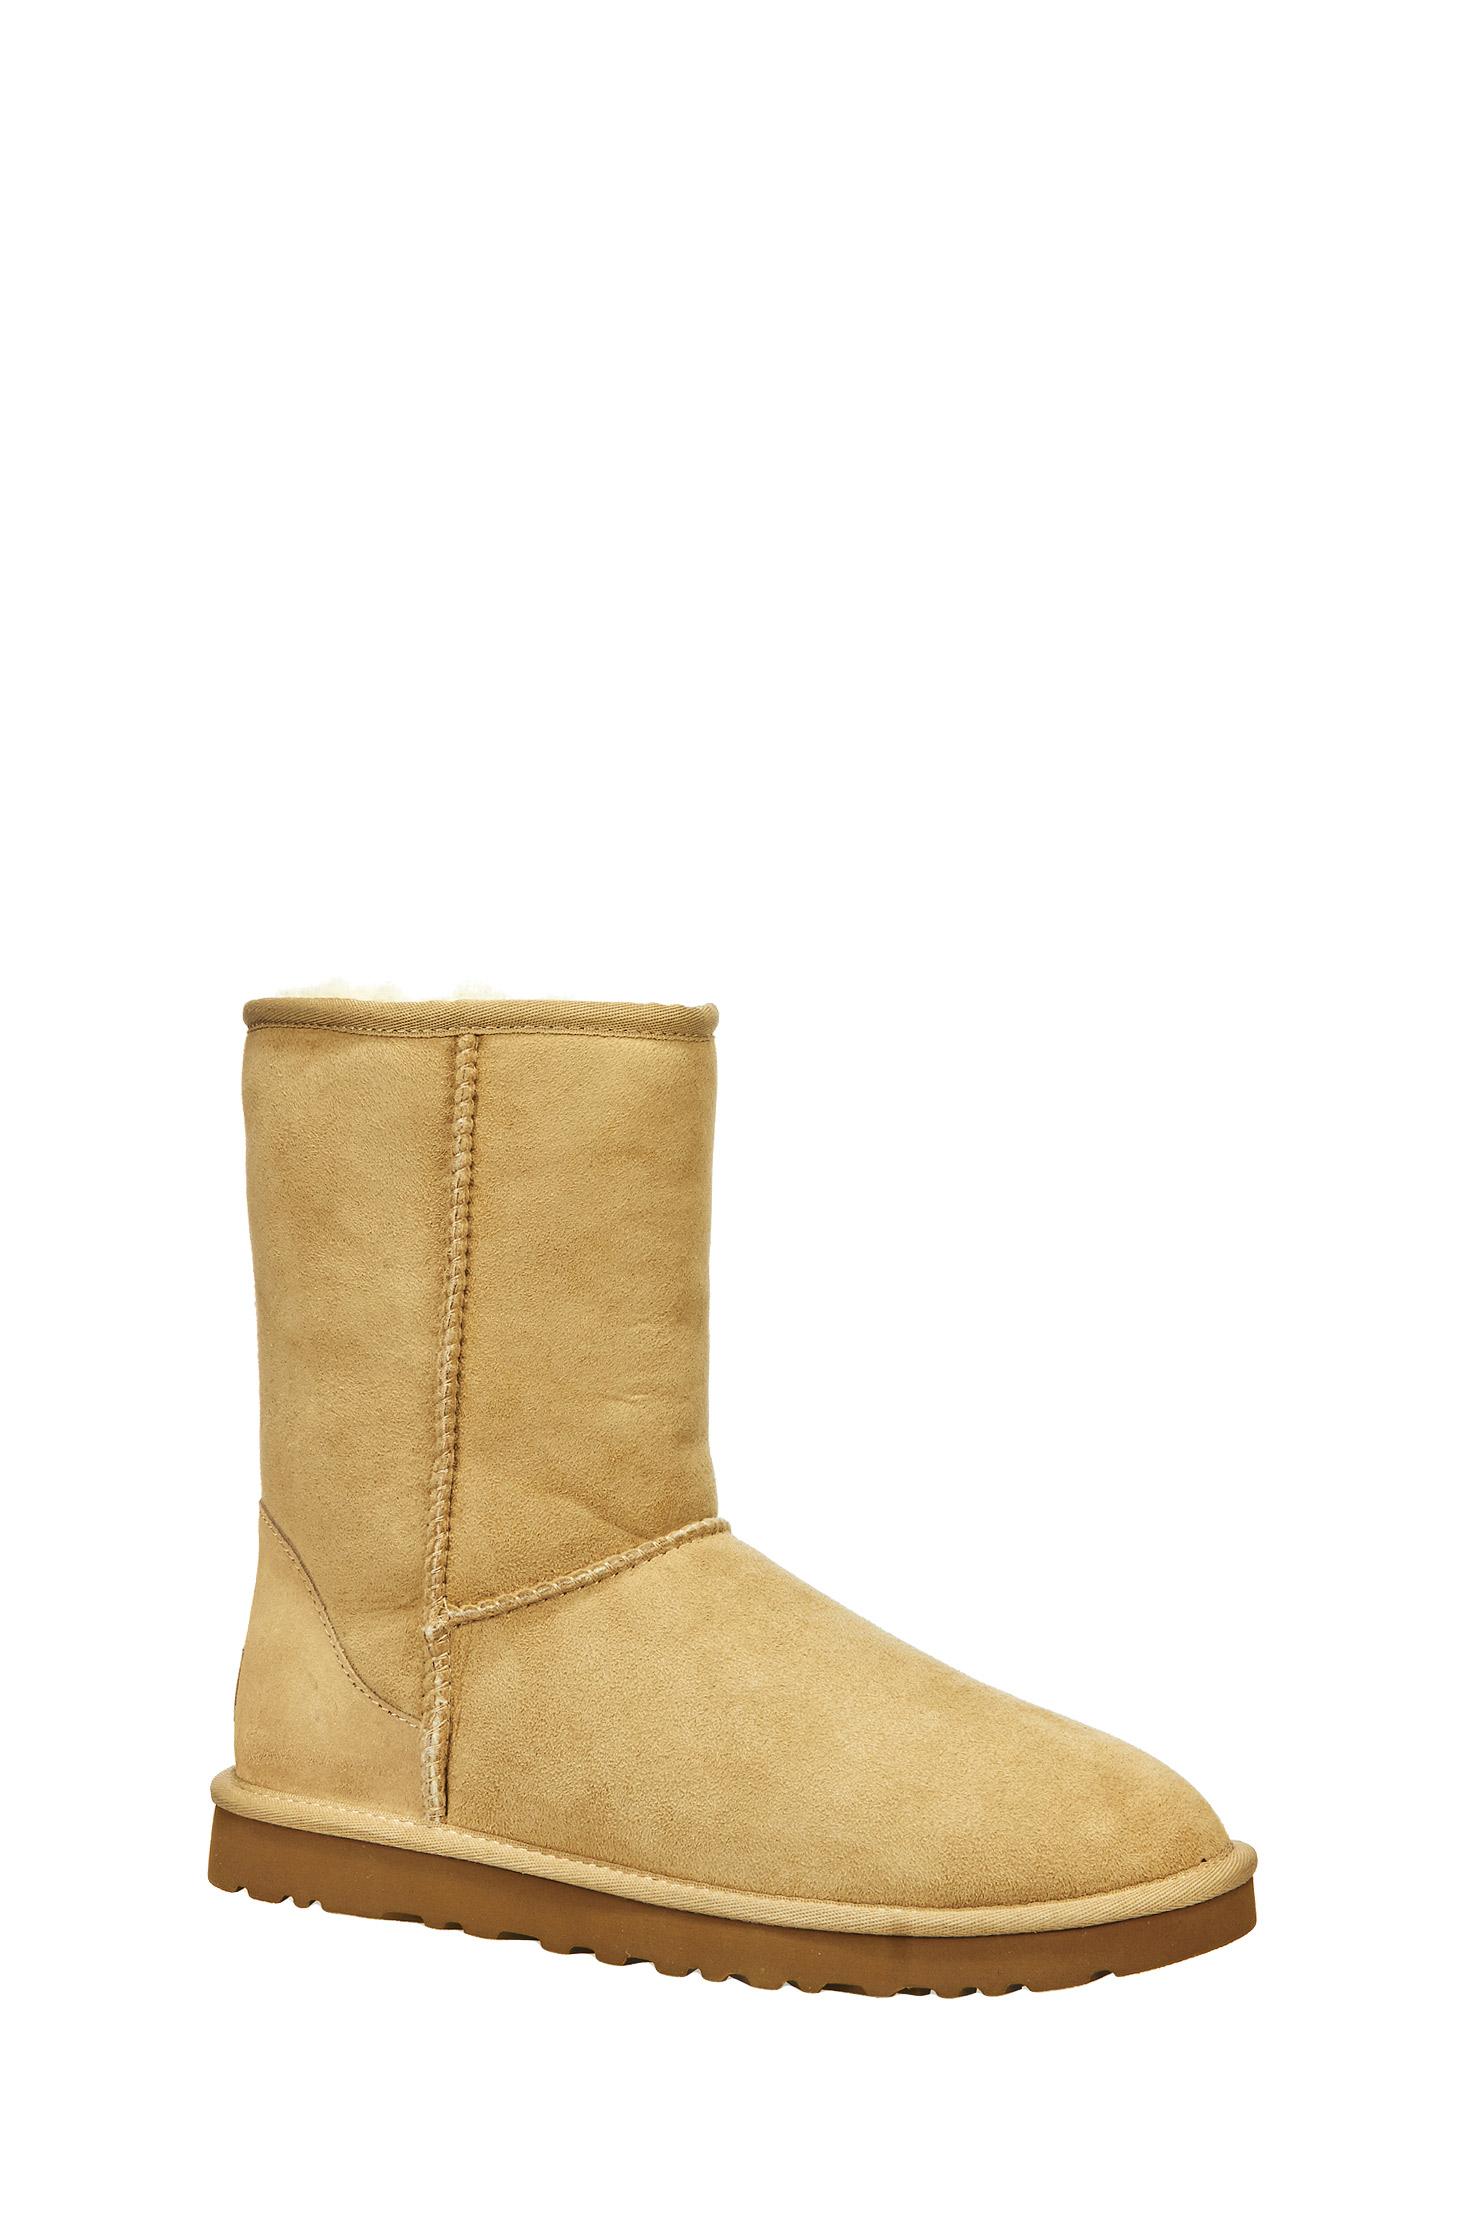 98df04b2437 Womens Short Tan Ugg Boots - cheap watches mgc-gas.com